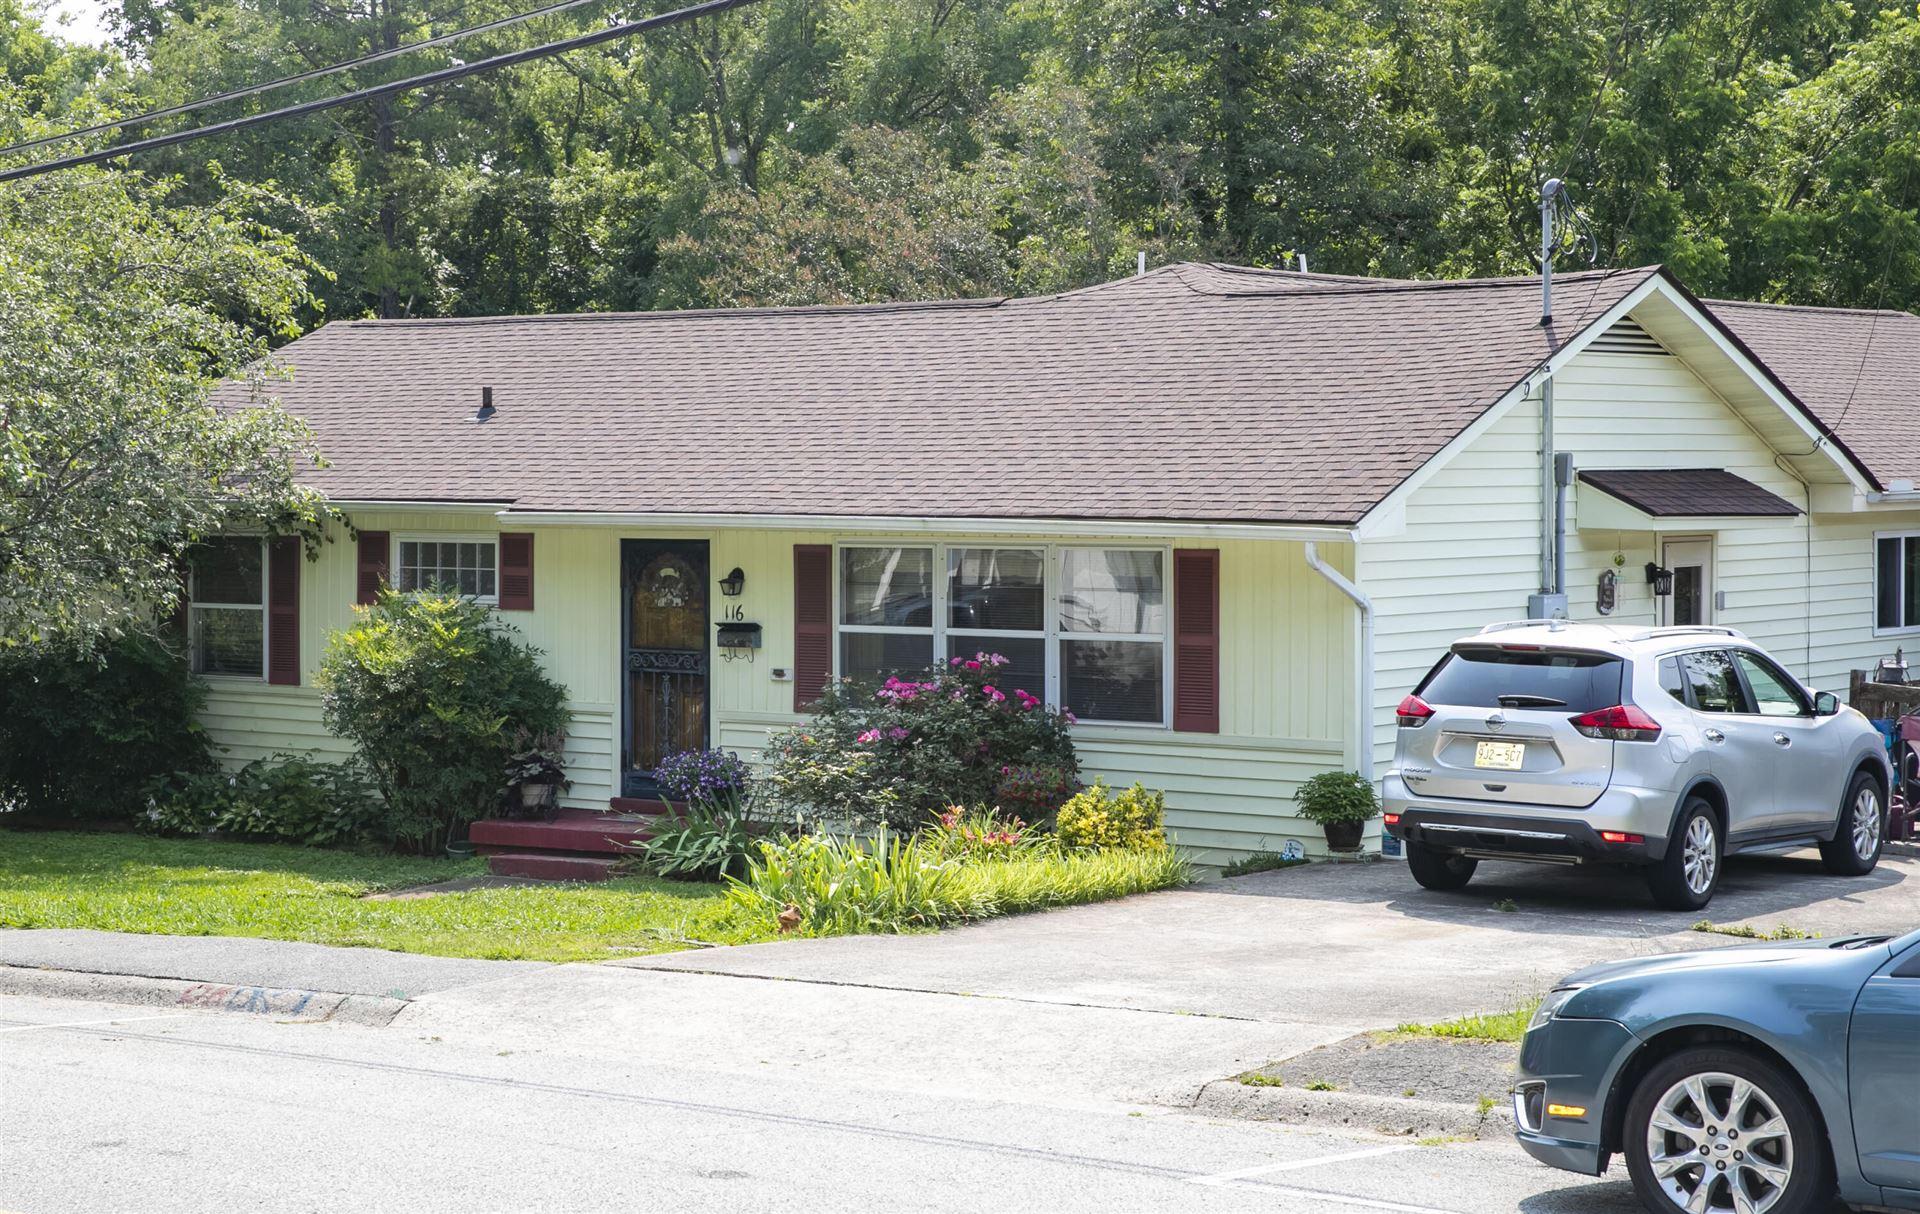 Photo of 116 Alger Rd, Oak Ridge, TN 37830 (MLS # 1159384)